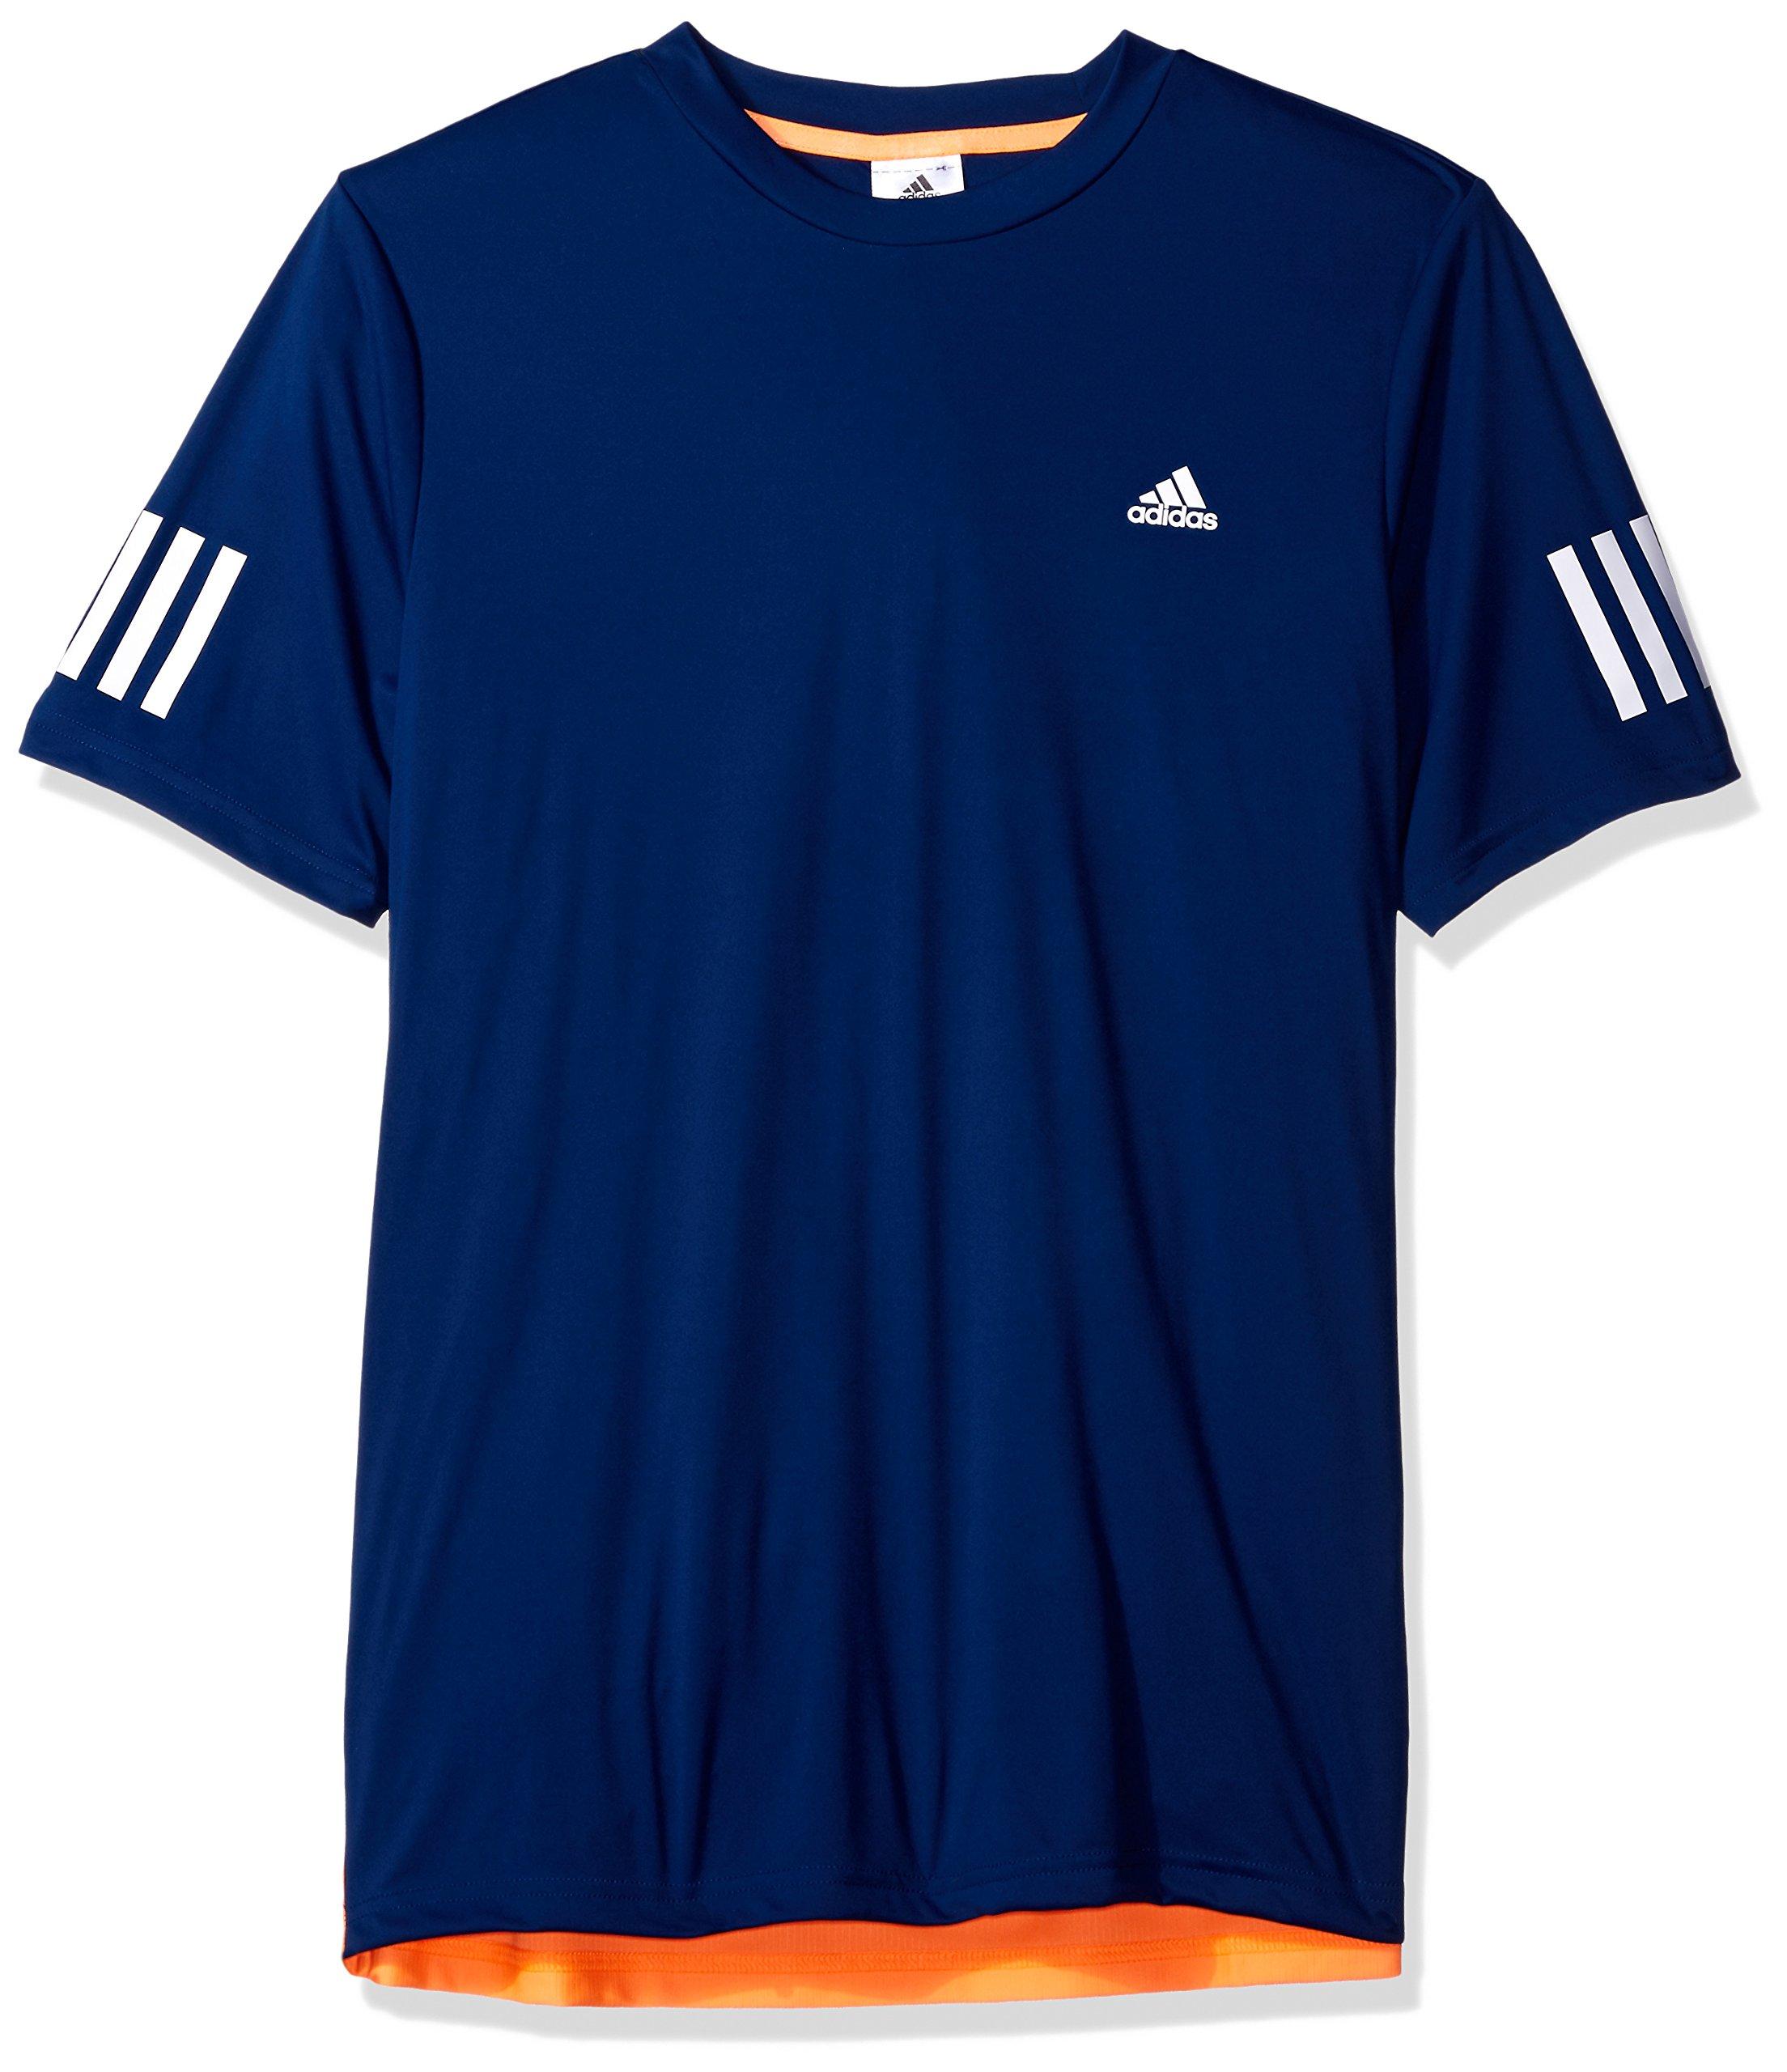 adidas Boys Tennis Club Tee, Mystery Blue/Samba Blue, X-Large